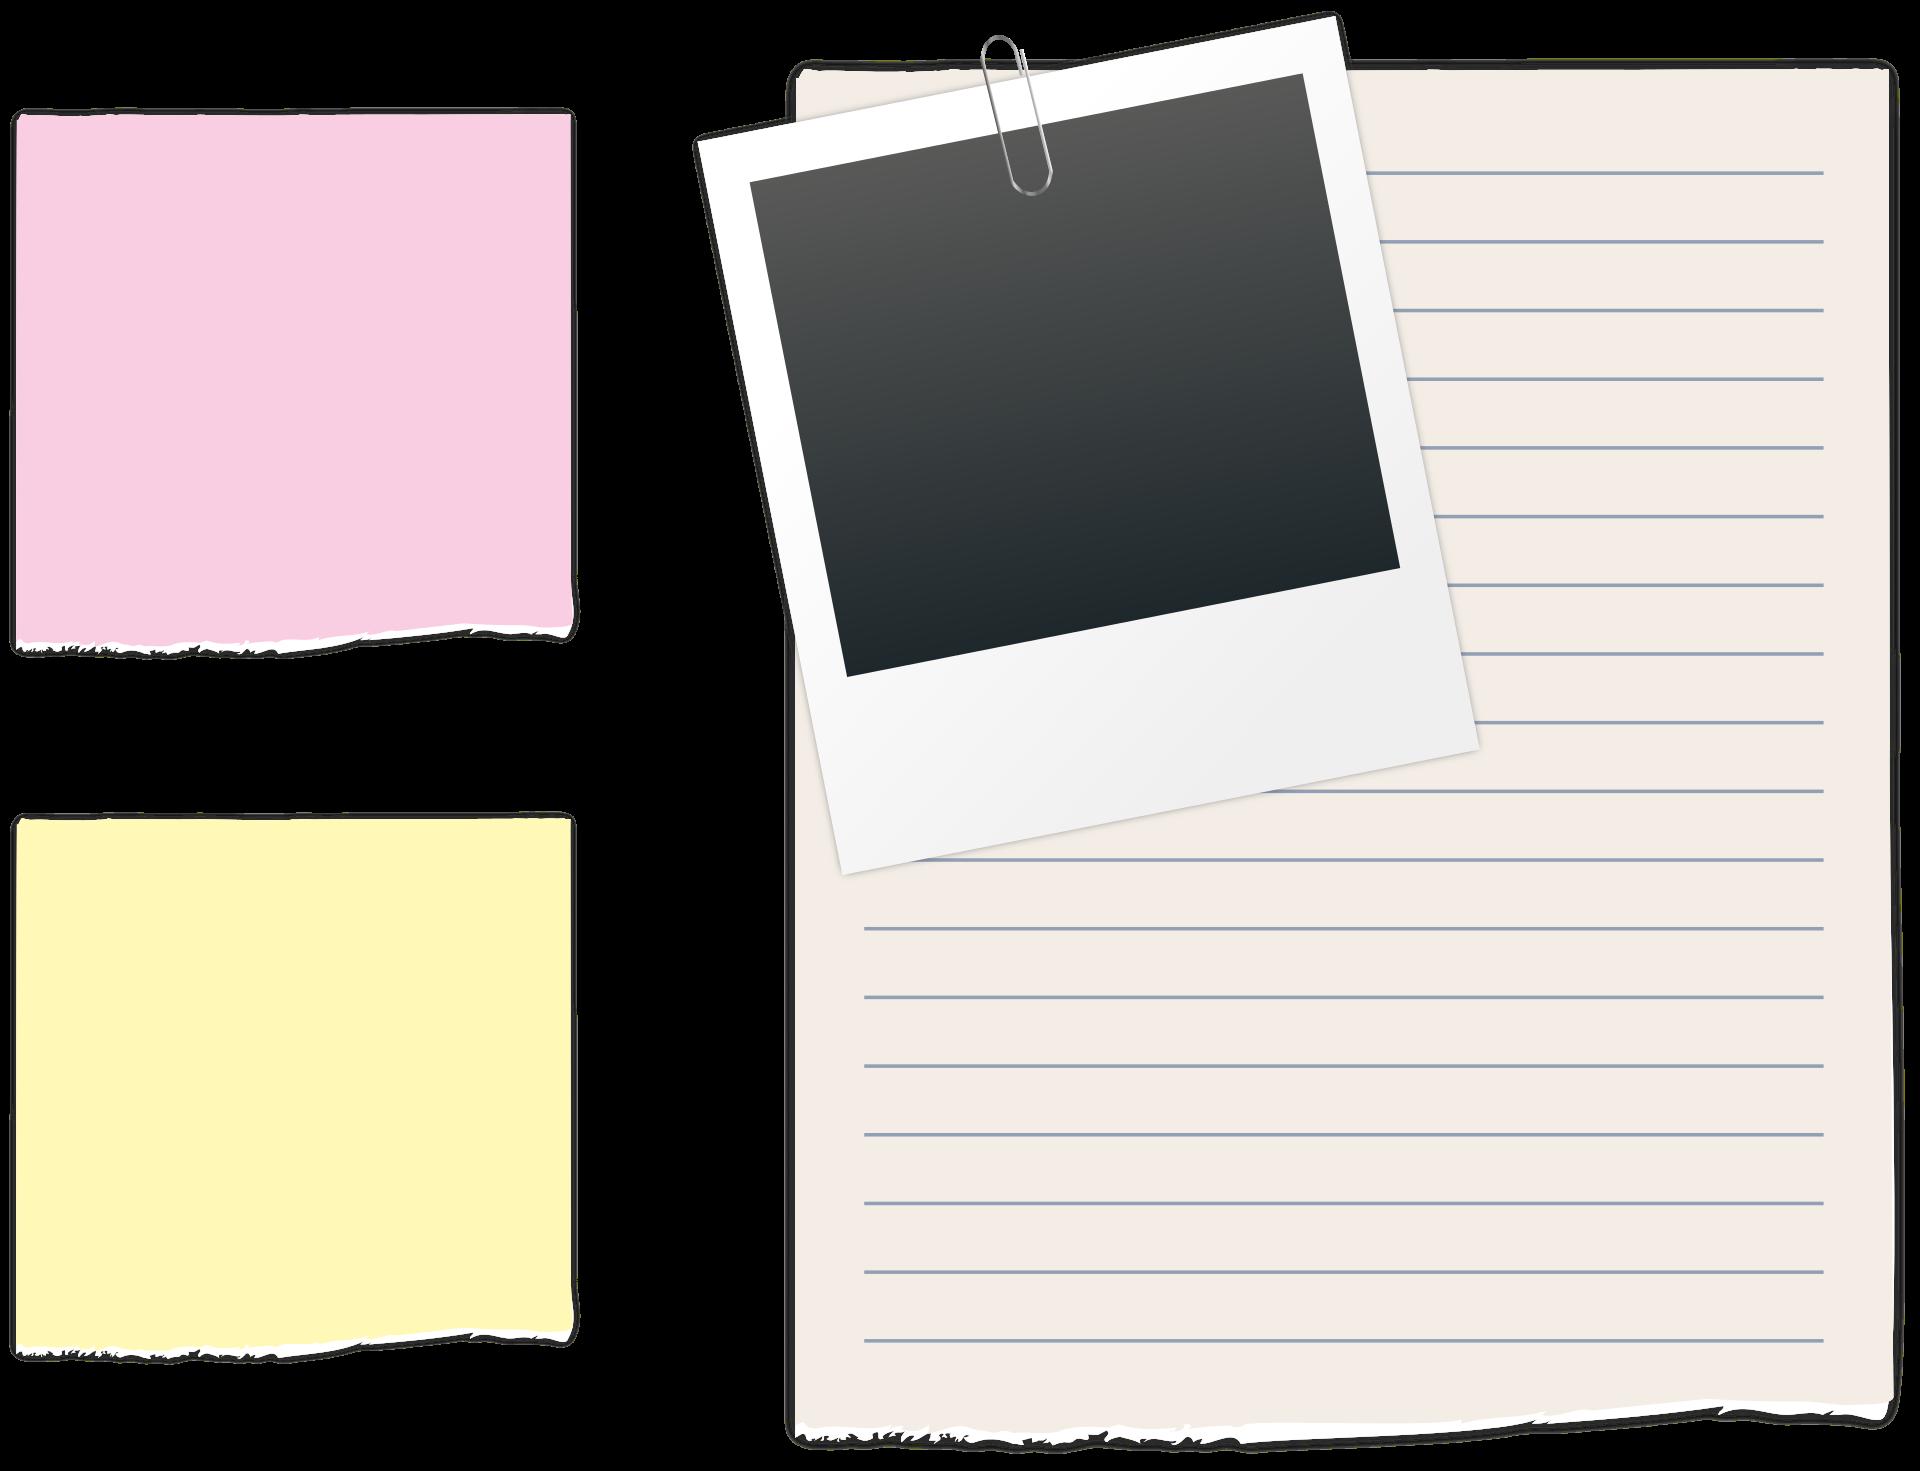 Lista de tarefas - foco no objetivo